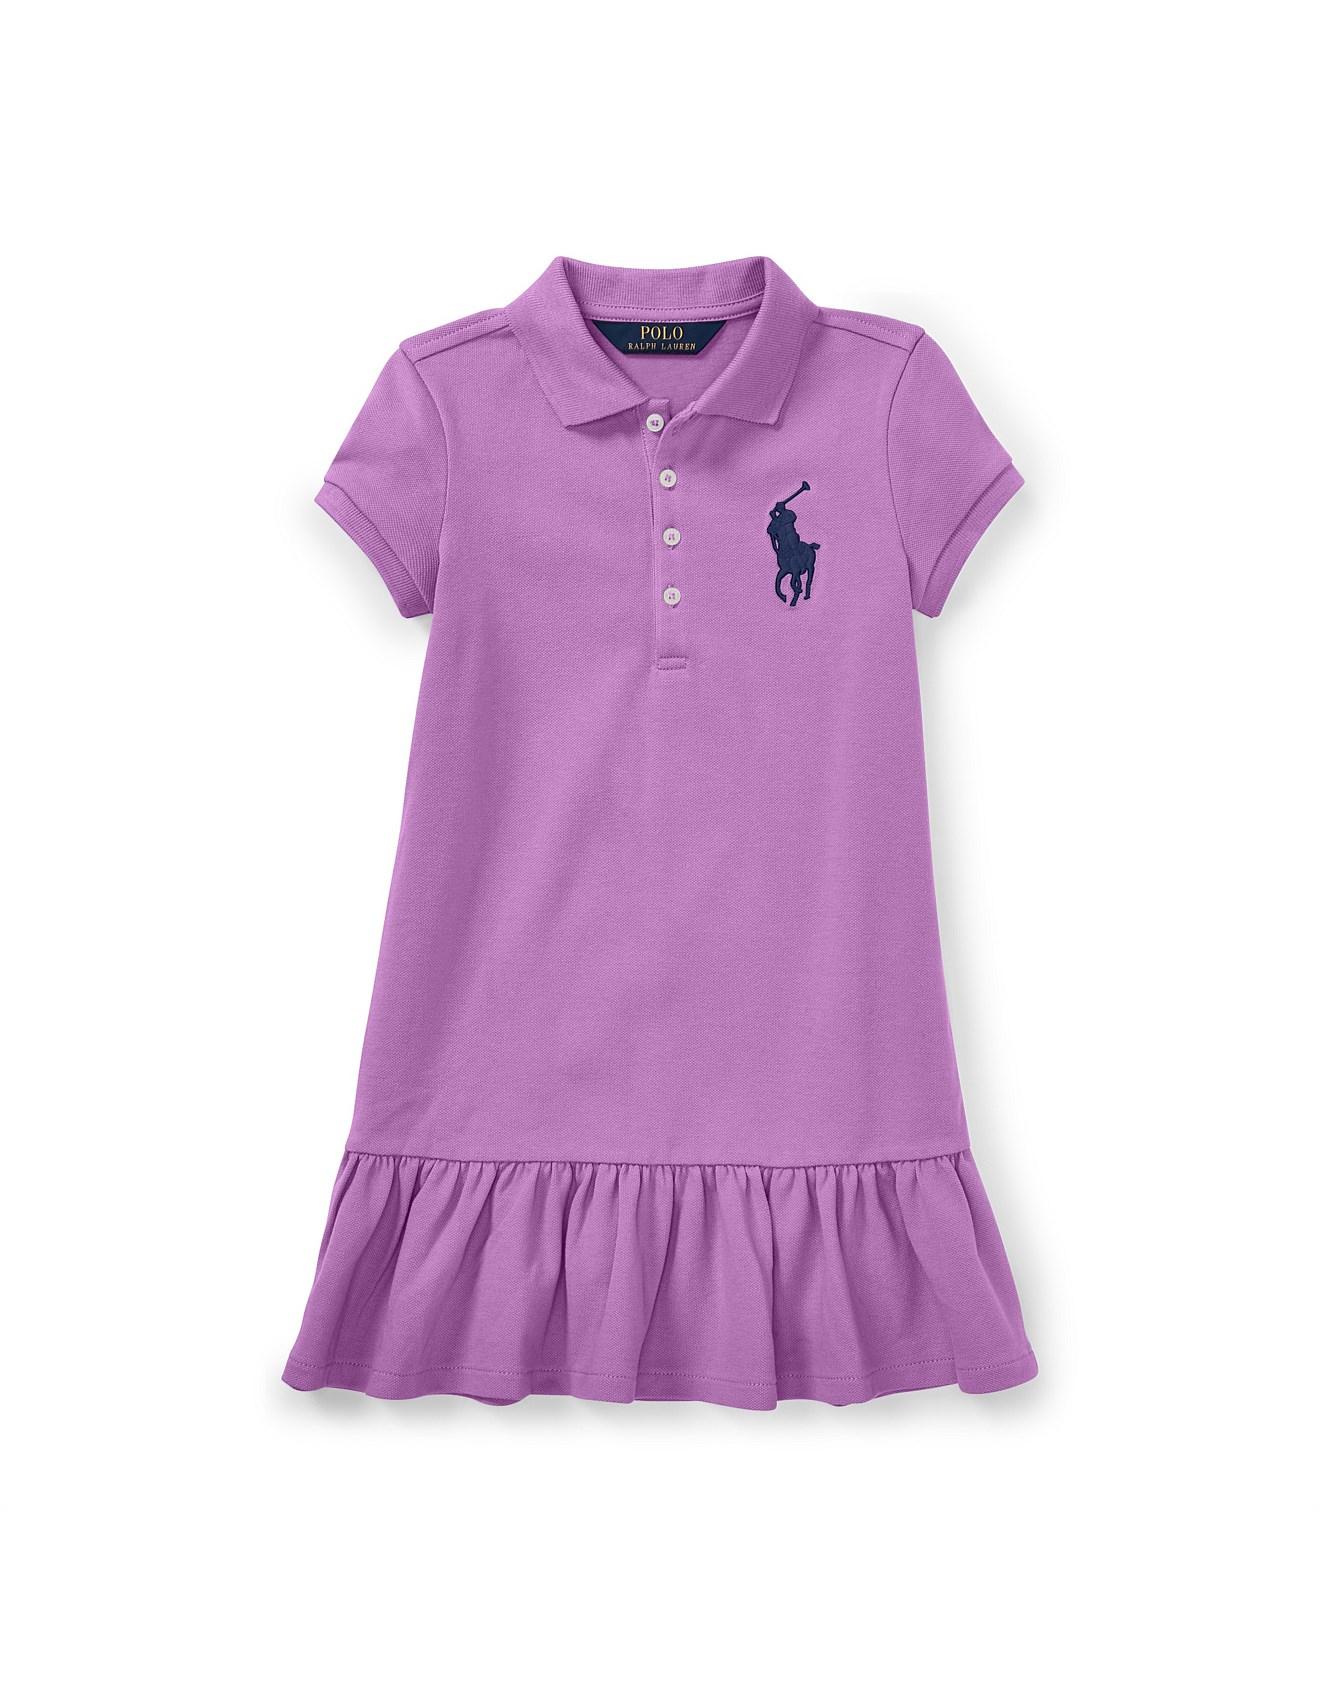 deac091a8 Girls - Big Pony Short-Sleeve Dress (2-3 Years)